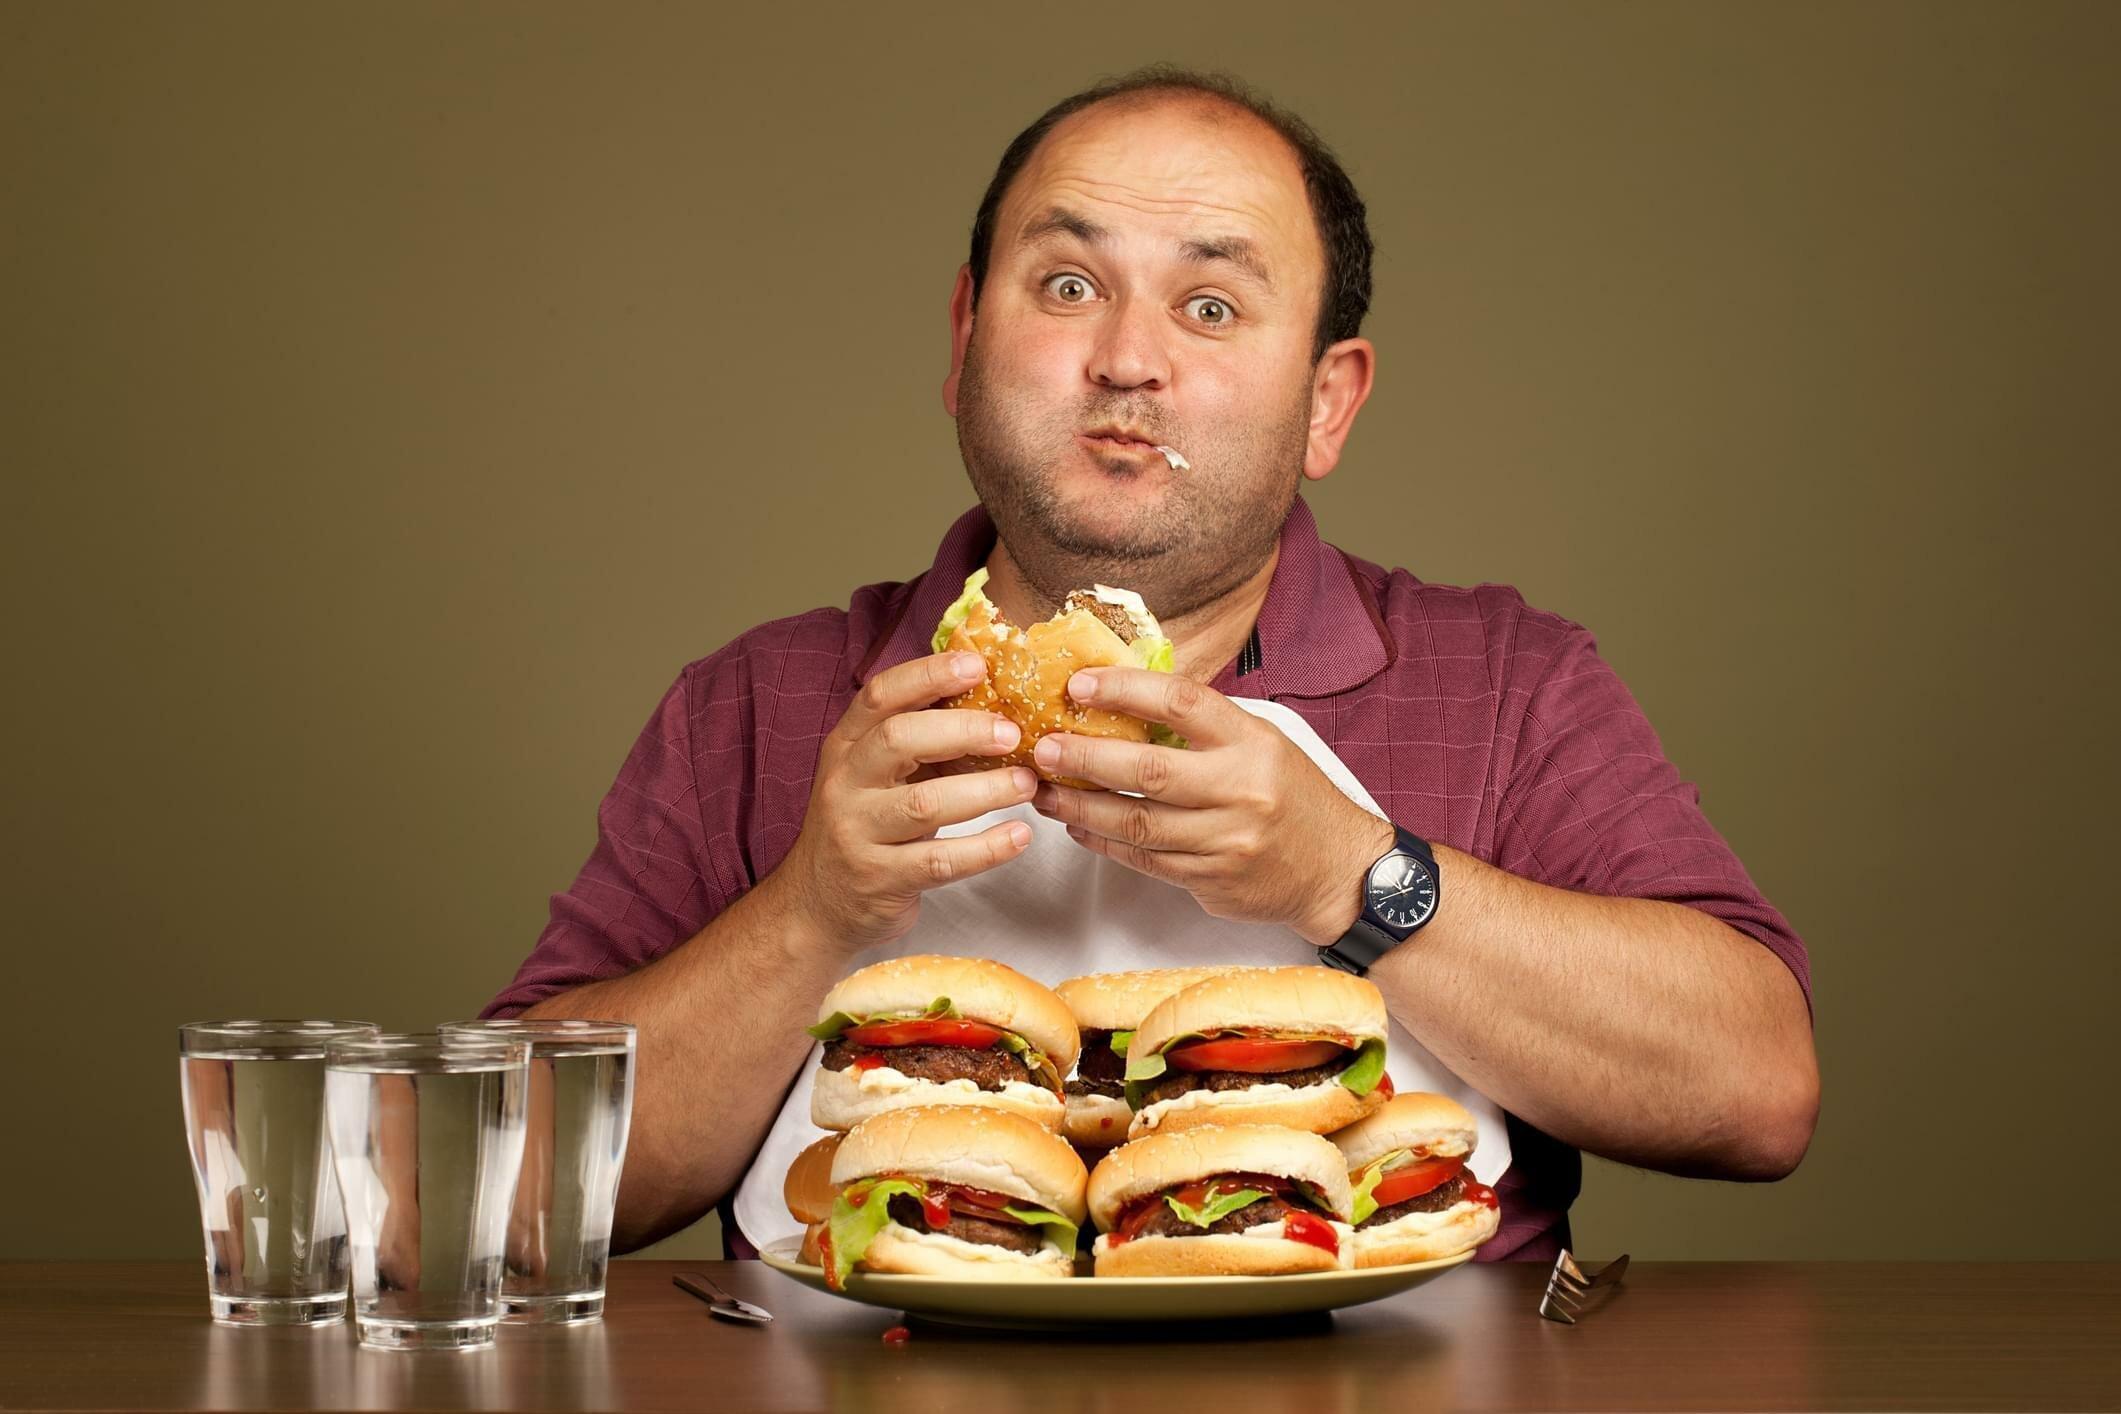 мужчина с лишним весом ест бургеры